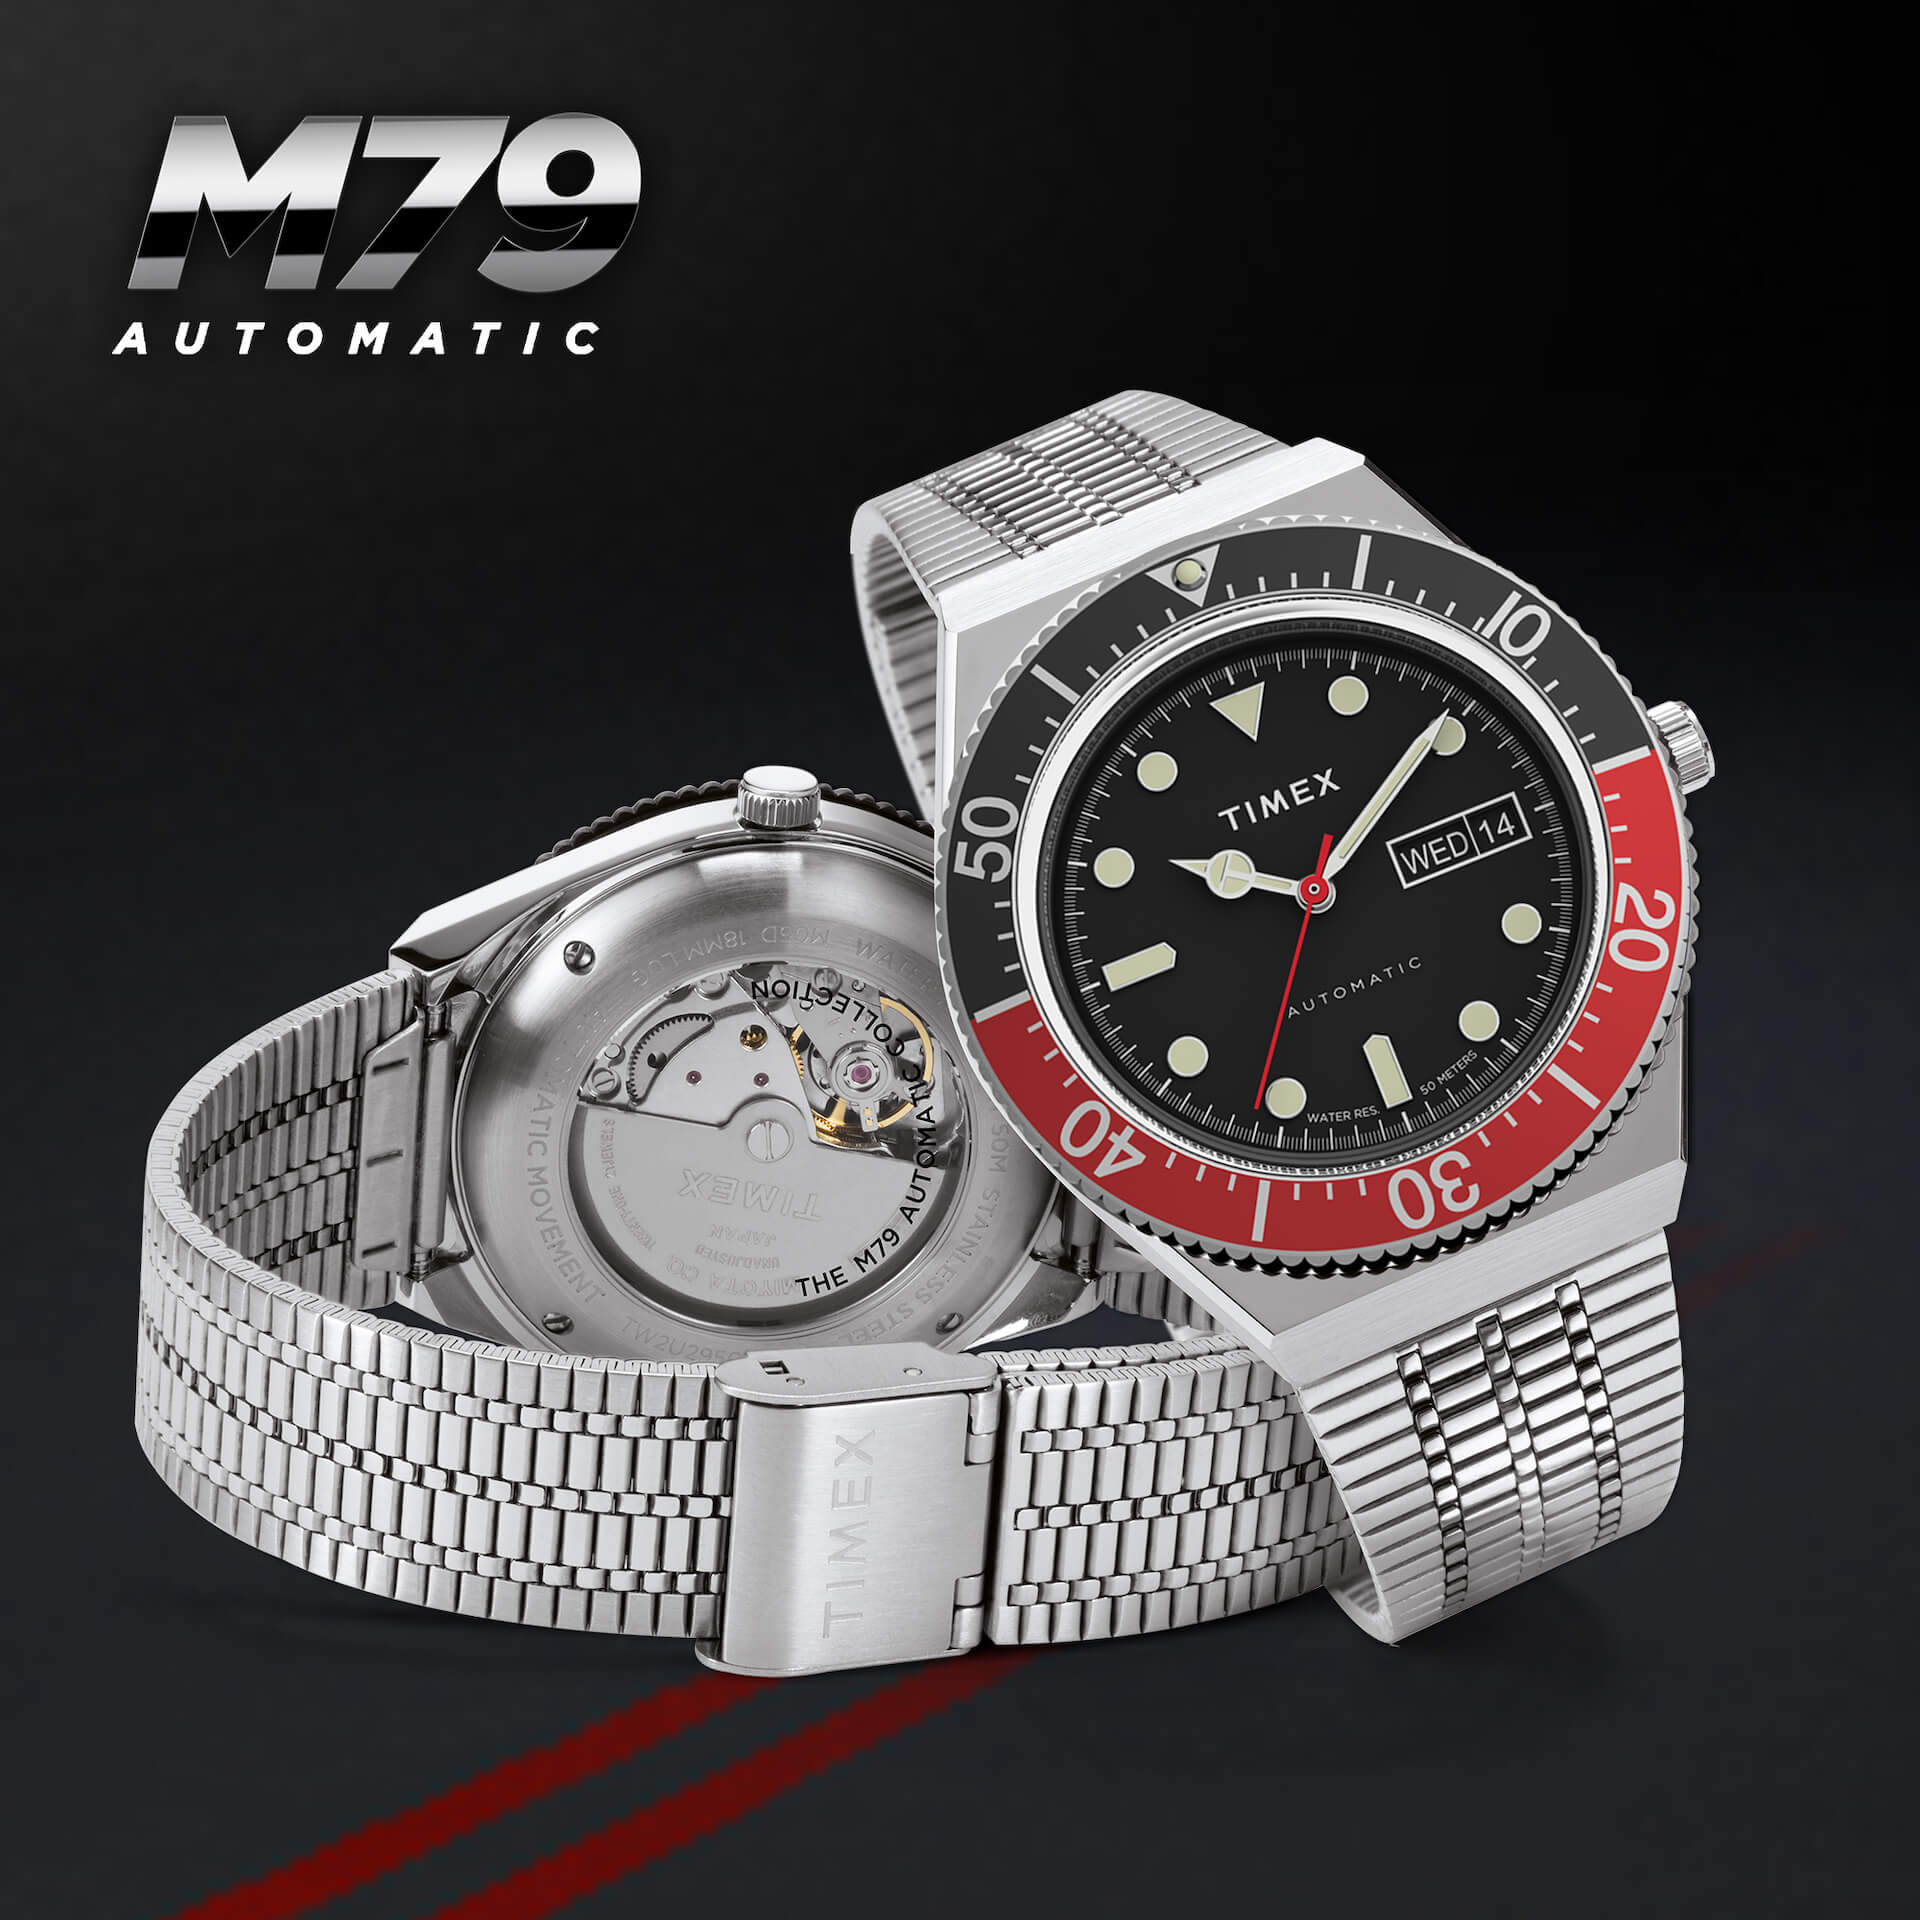 TIMEXの「Q TIMEX」シリーズ『M79』に新色ブラック×レッドカラーが登場!本日予約受付開始 tech210528_qtimex_1